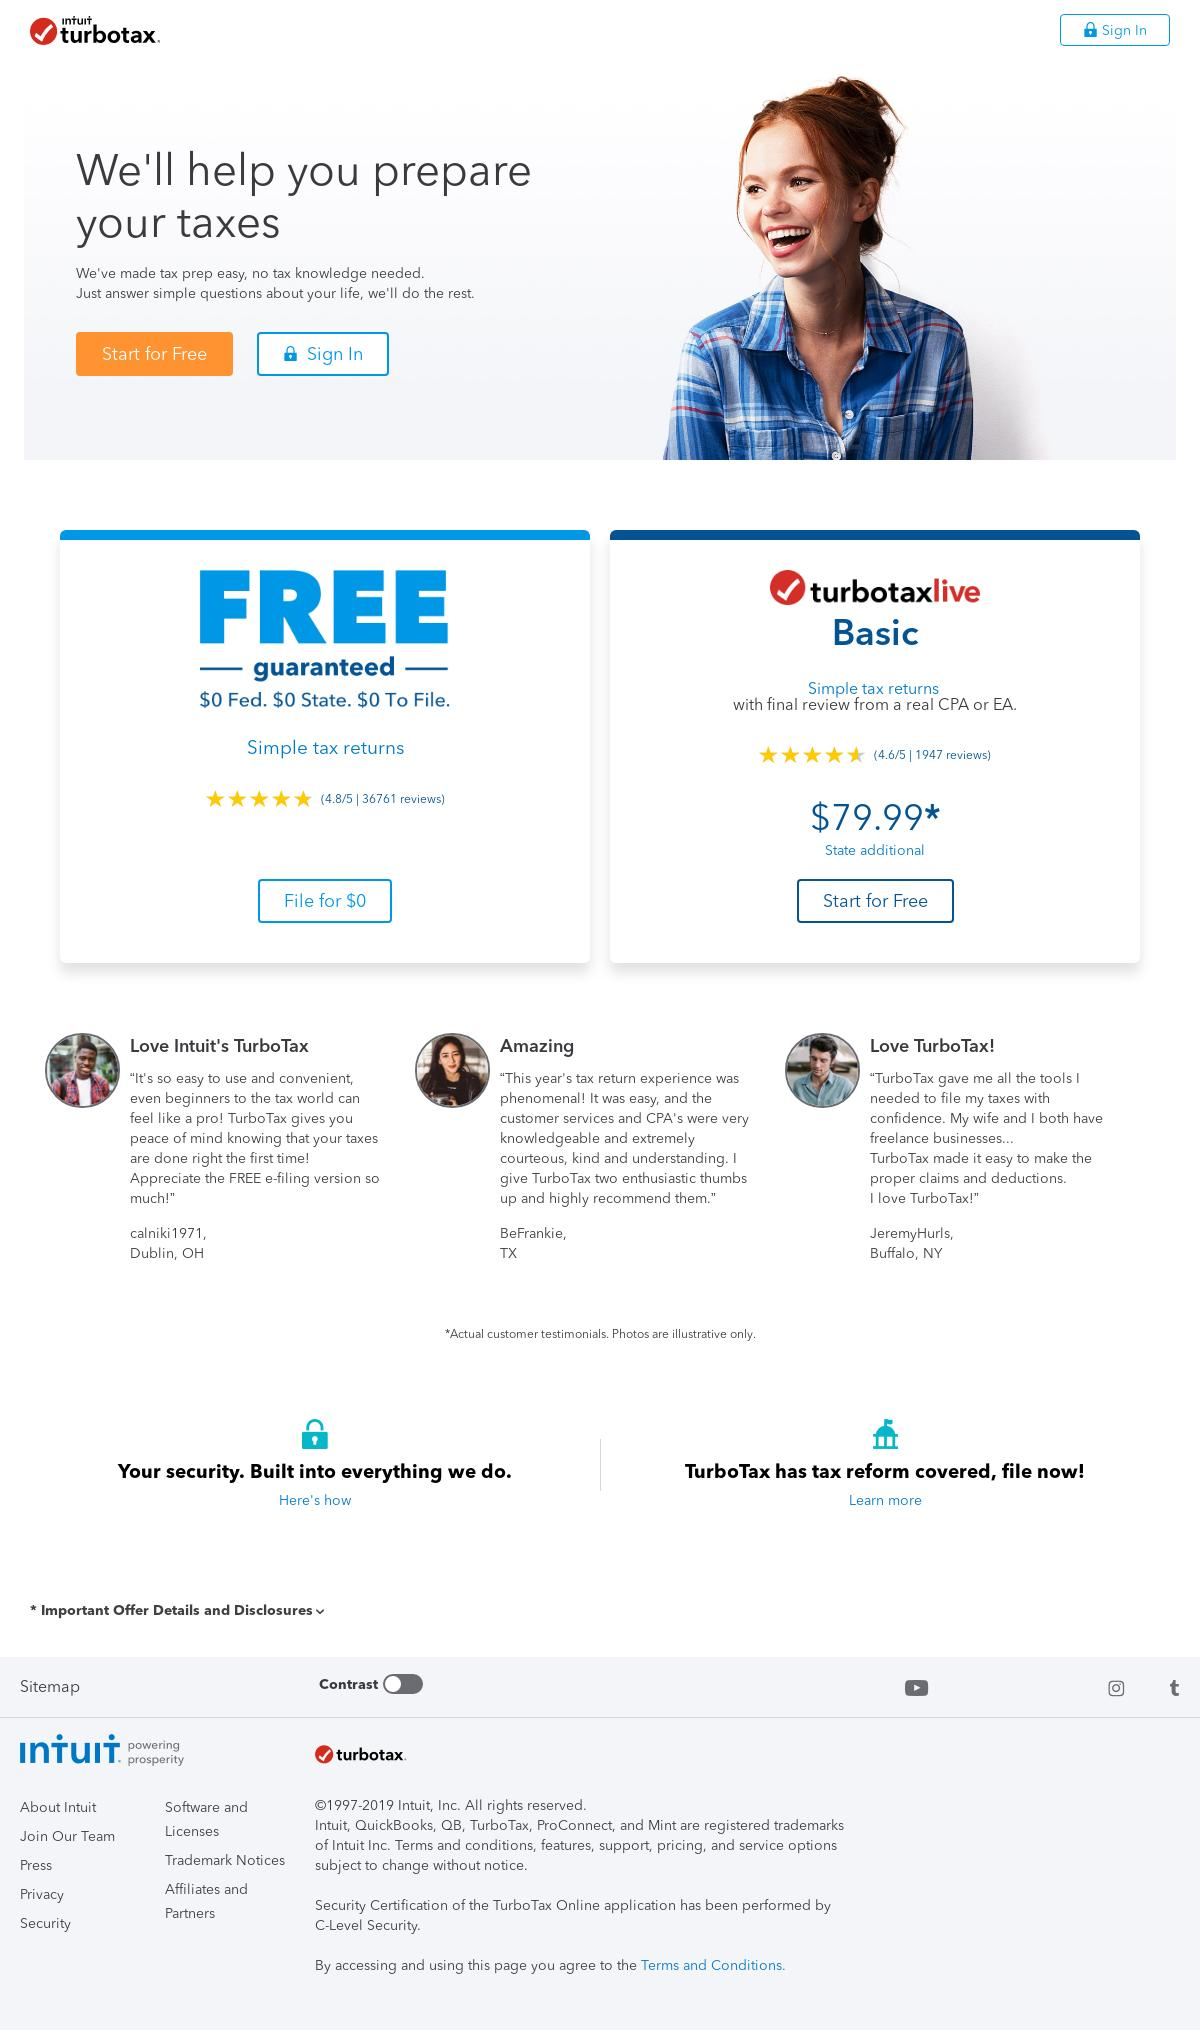 turbotax intuit com Landing Page Design for Seasonal / Tax